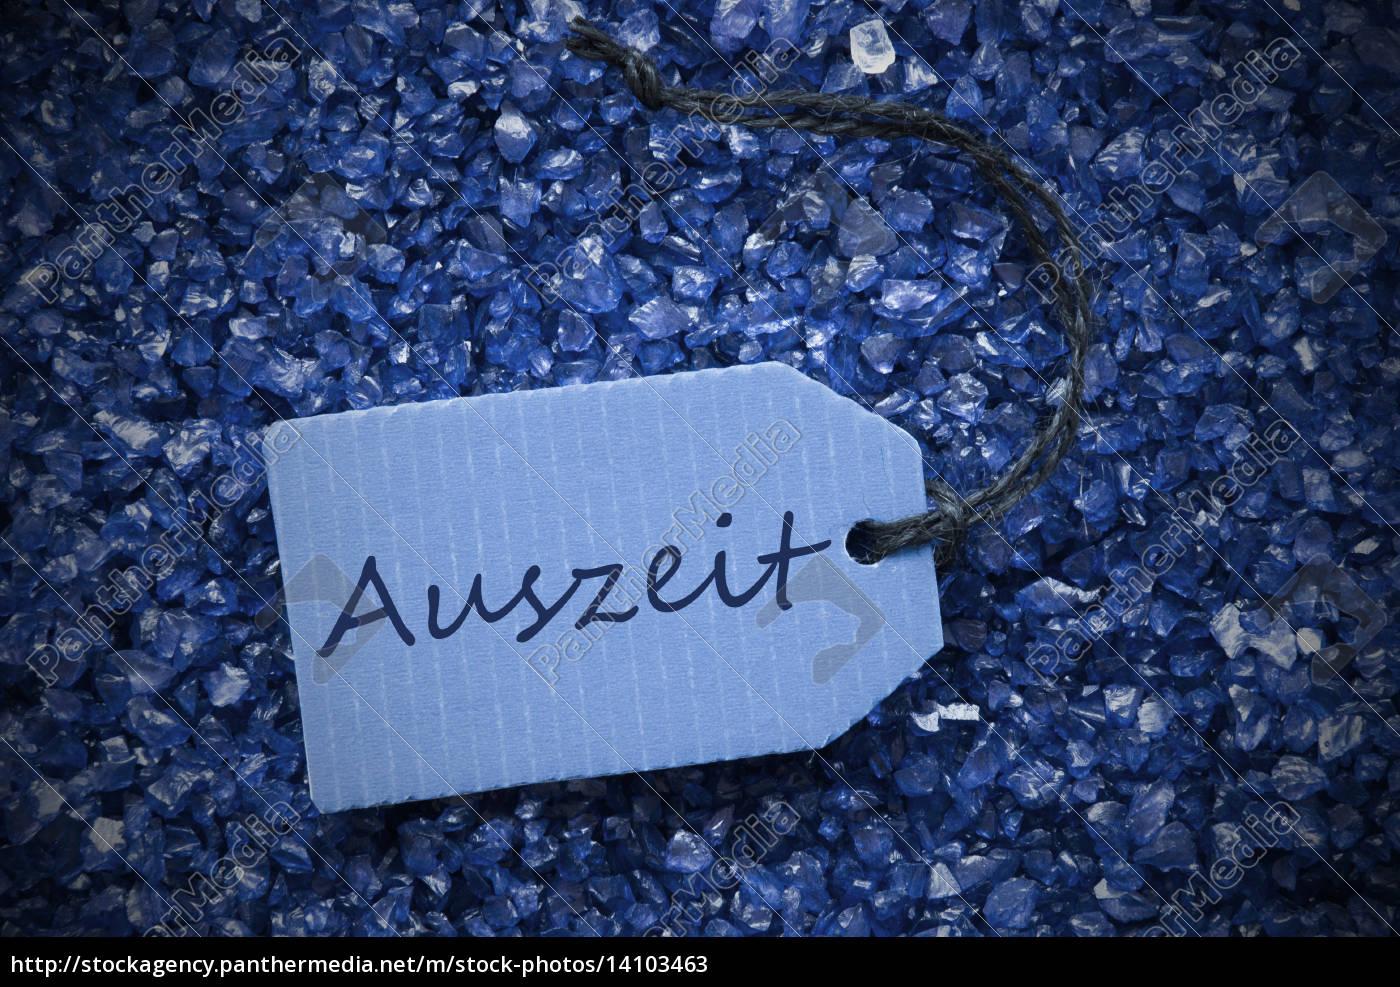 purple, stones, with, label, auszeit, means - 14103463